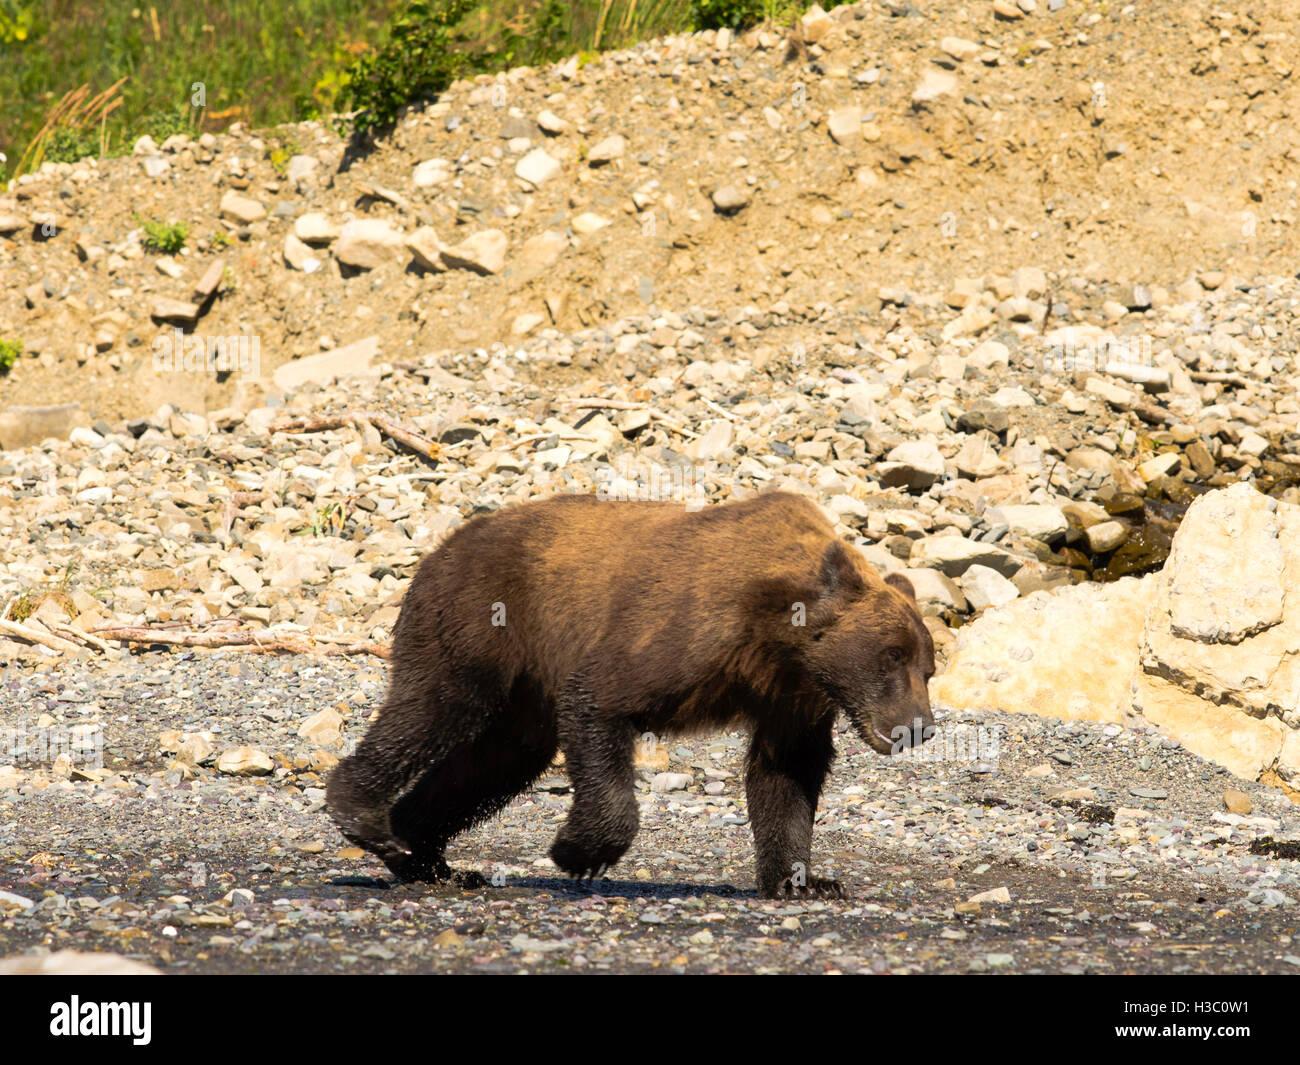 An Alaska coastal brown bear runs across the rocks on the shore of Chinitna Bay, Lake Clark National Park, Alaska. - Stock Image